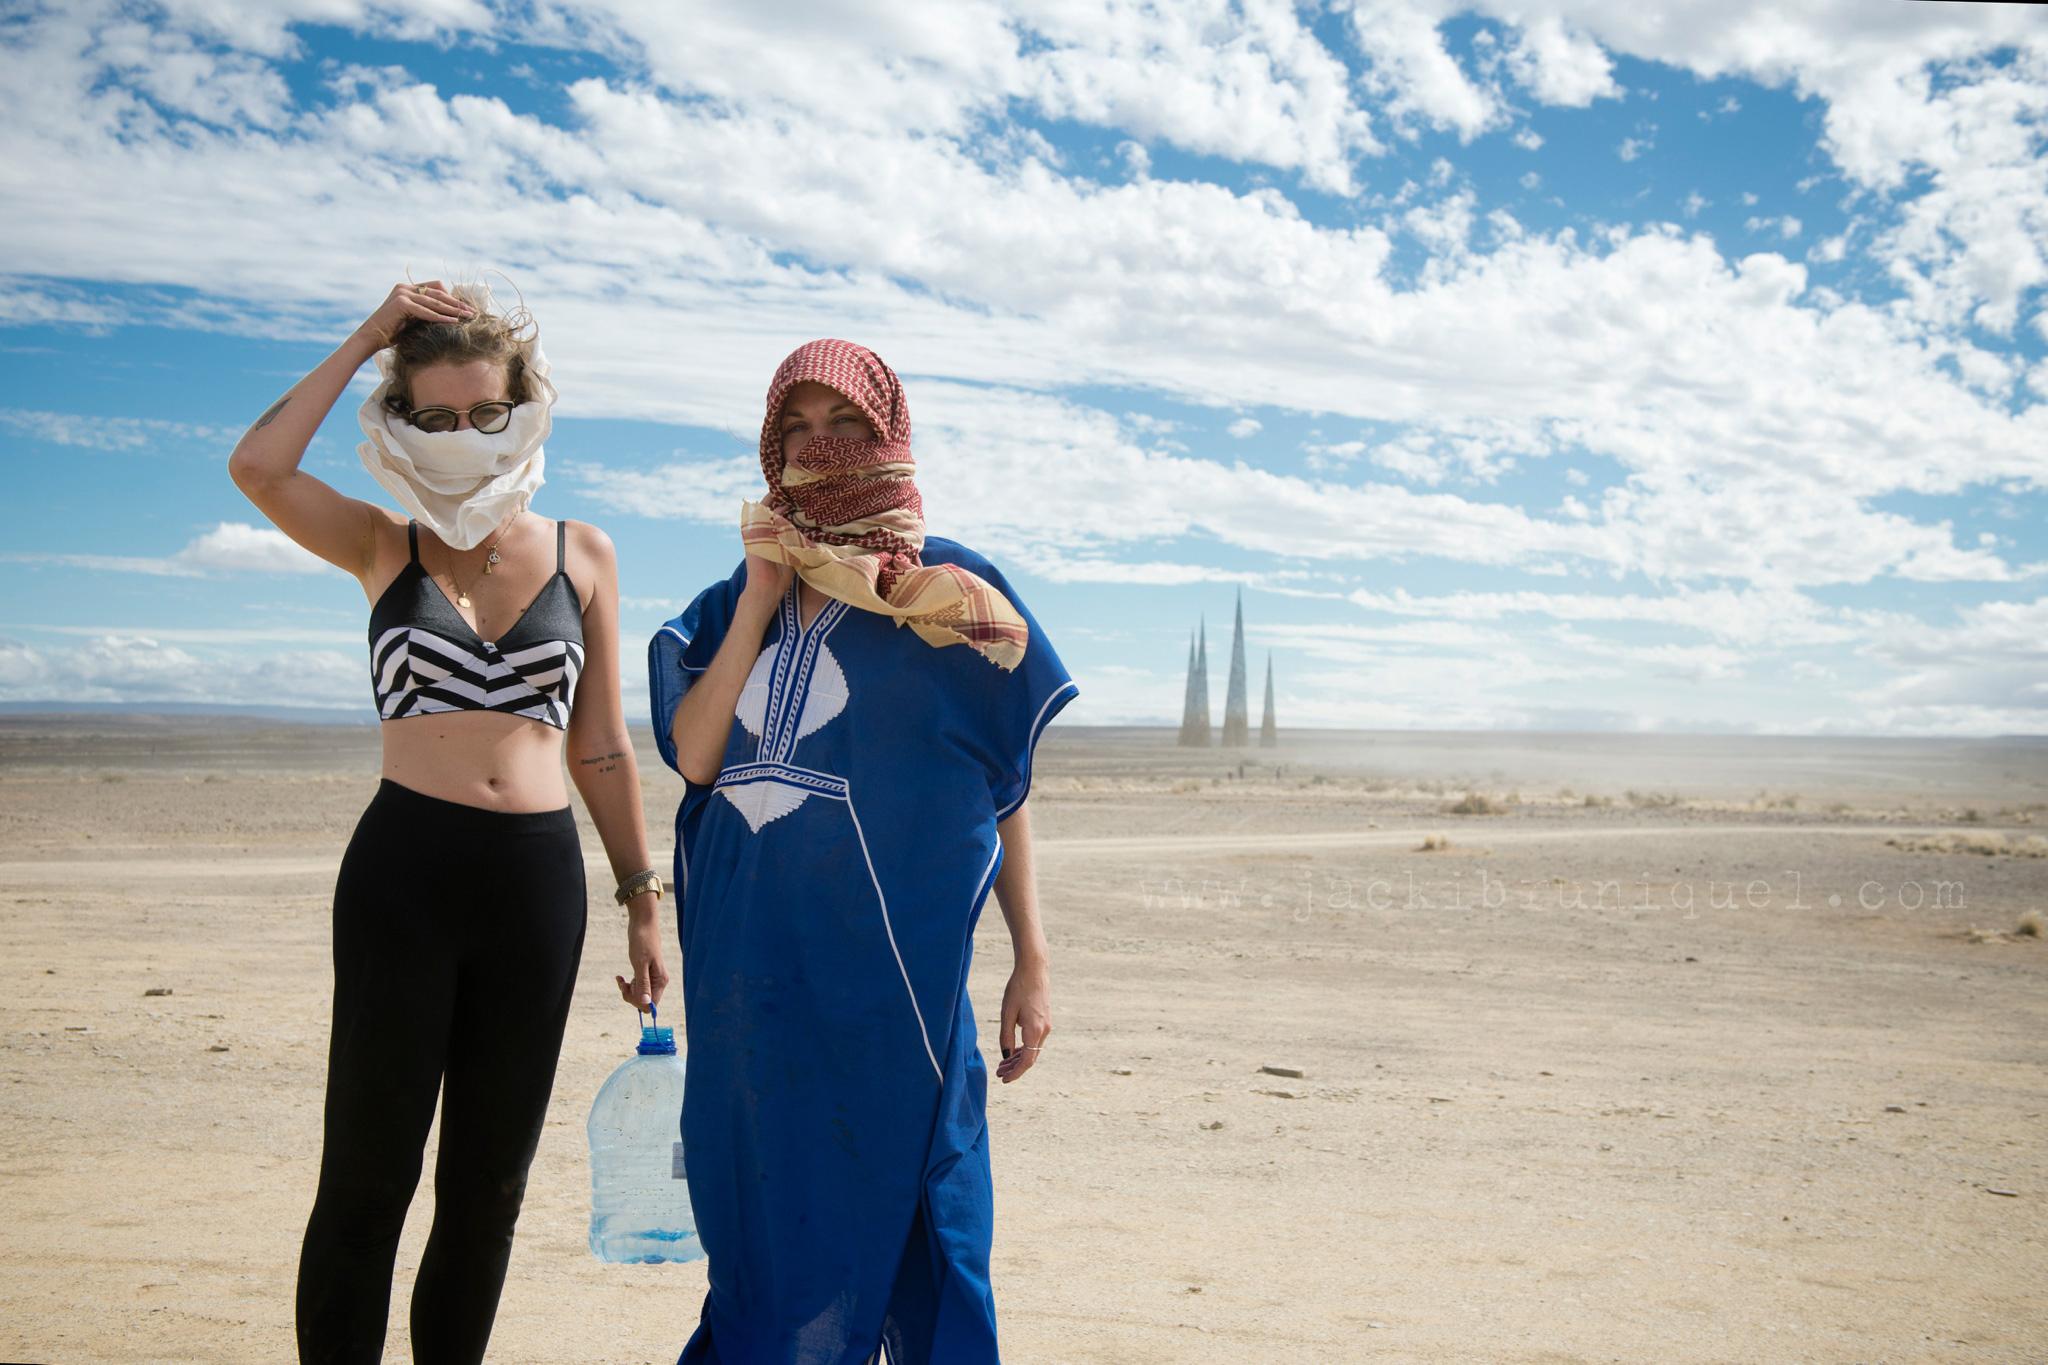 Girls in Dust Storm at Afrika Burn